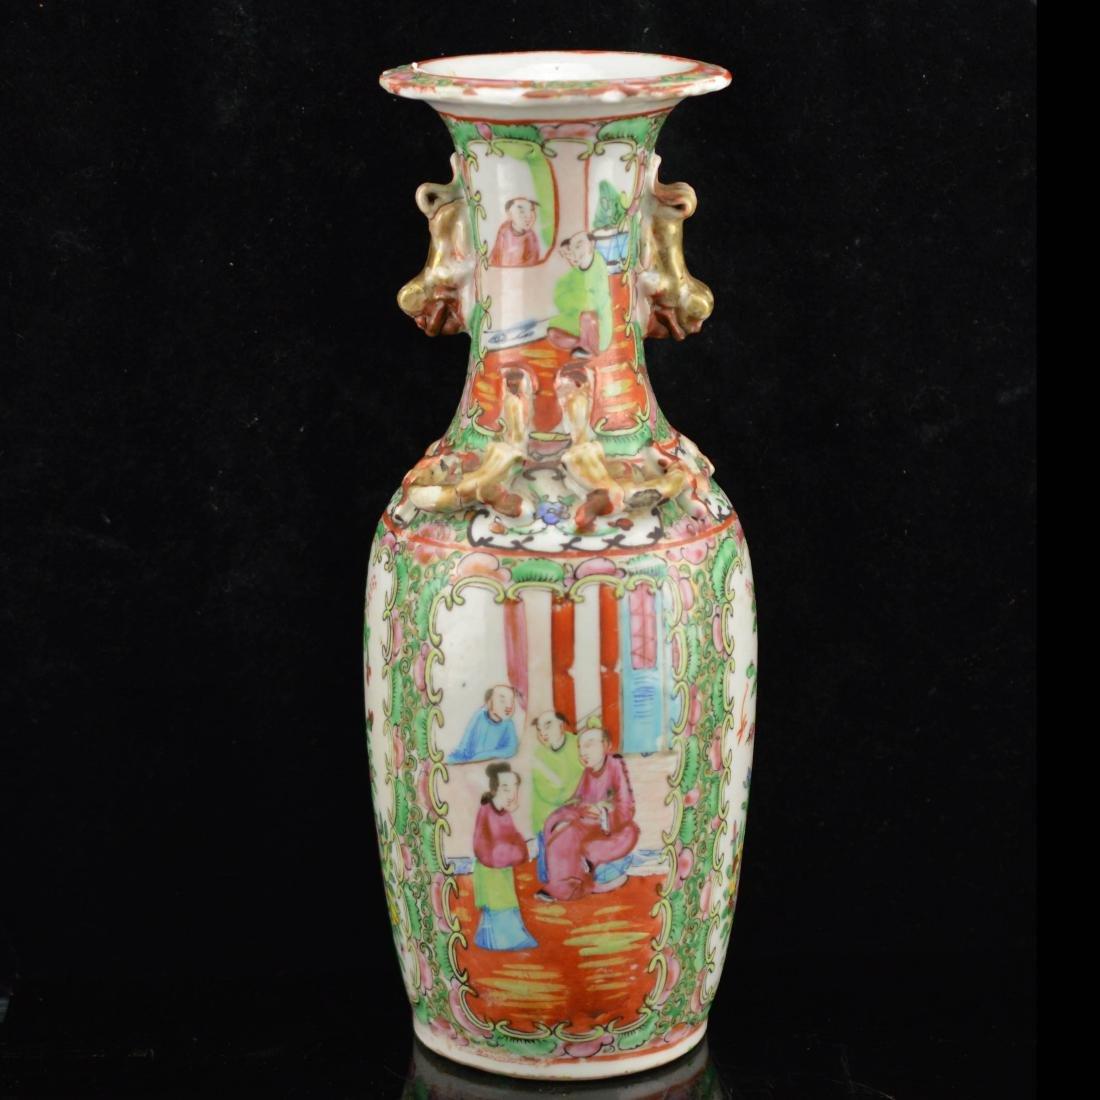 Guang Cai porcelain vase